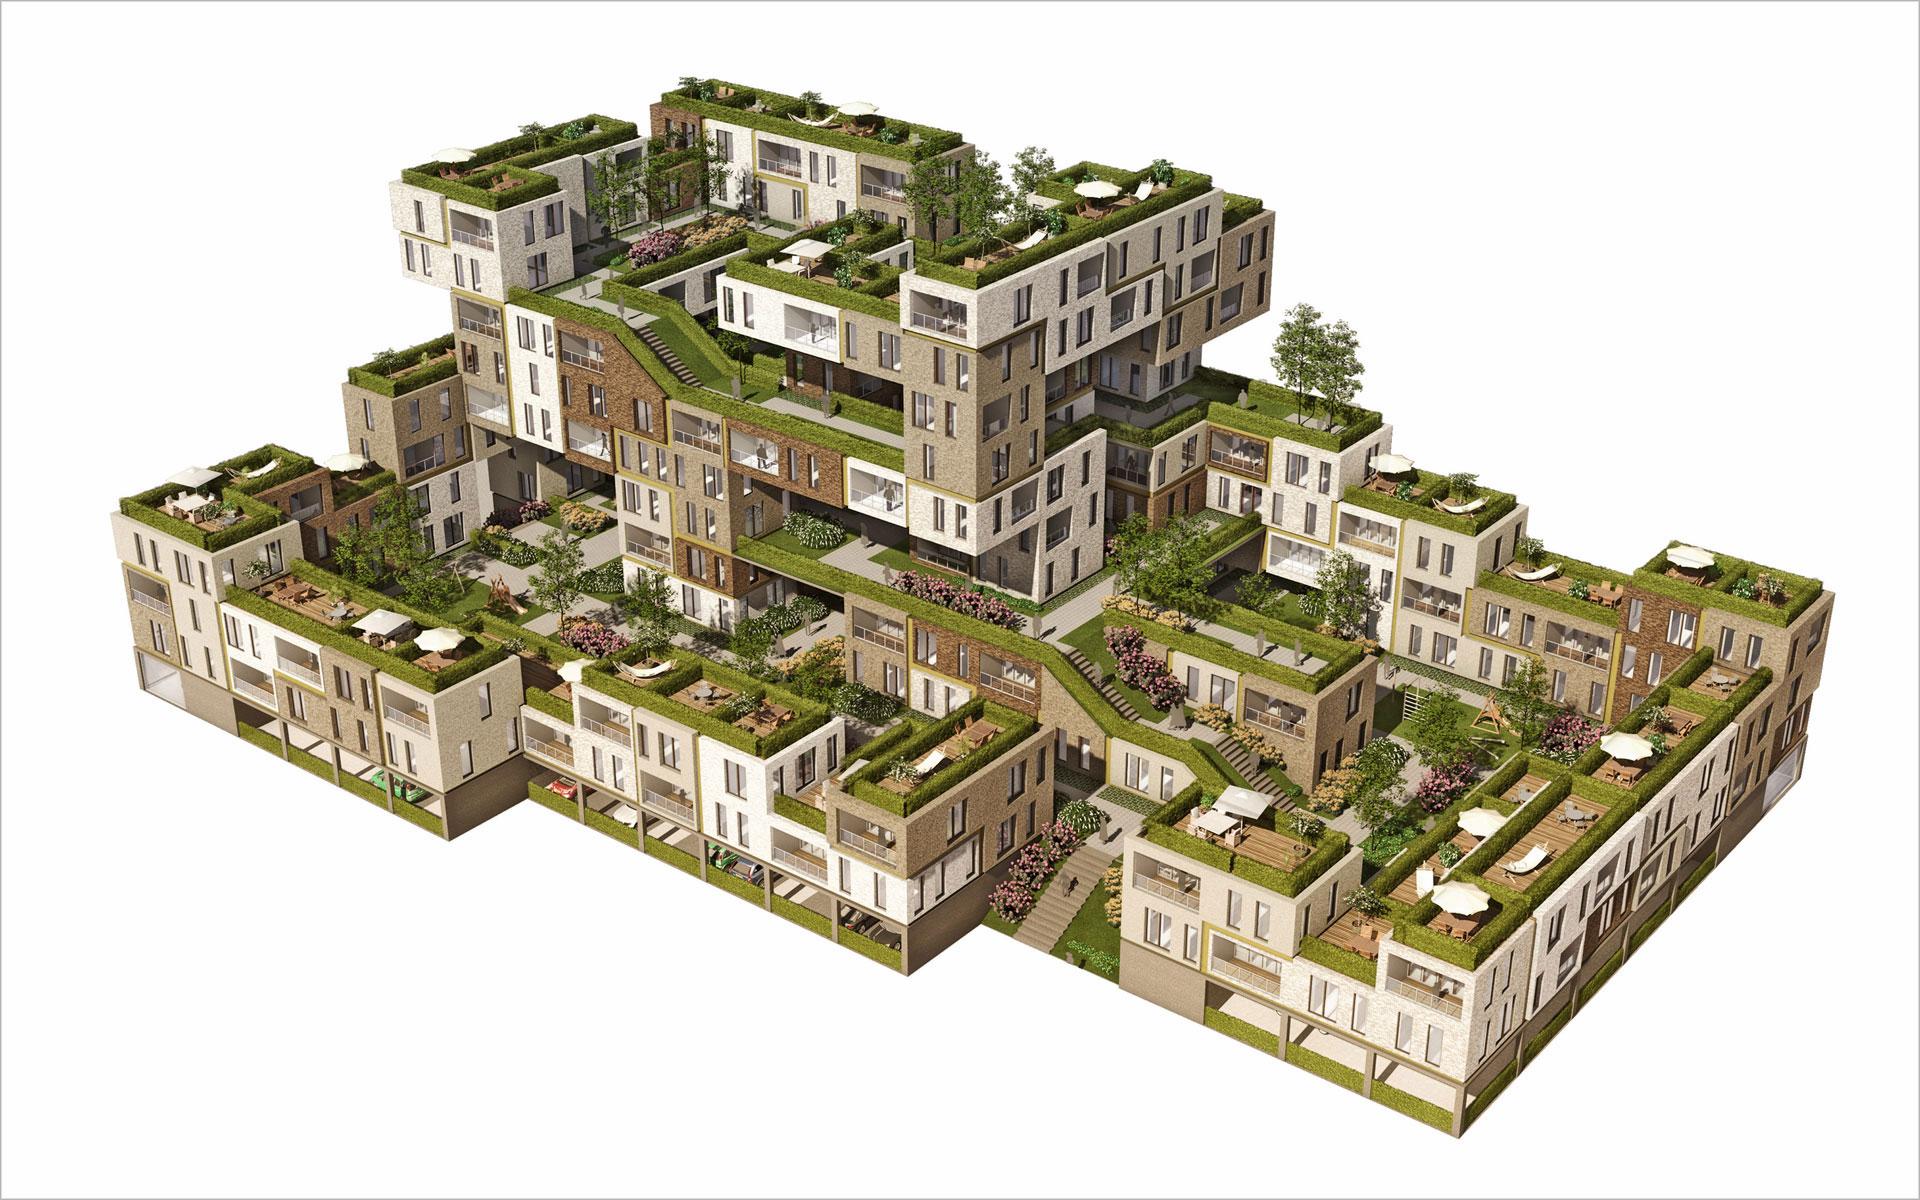 Binnenstedelijk woonconcept gezinswoningen - BINT architecten